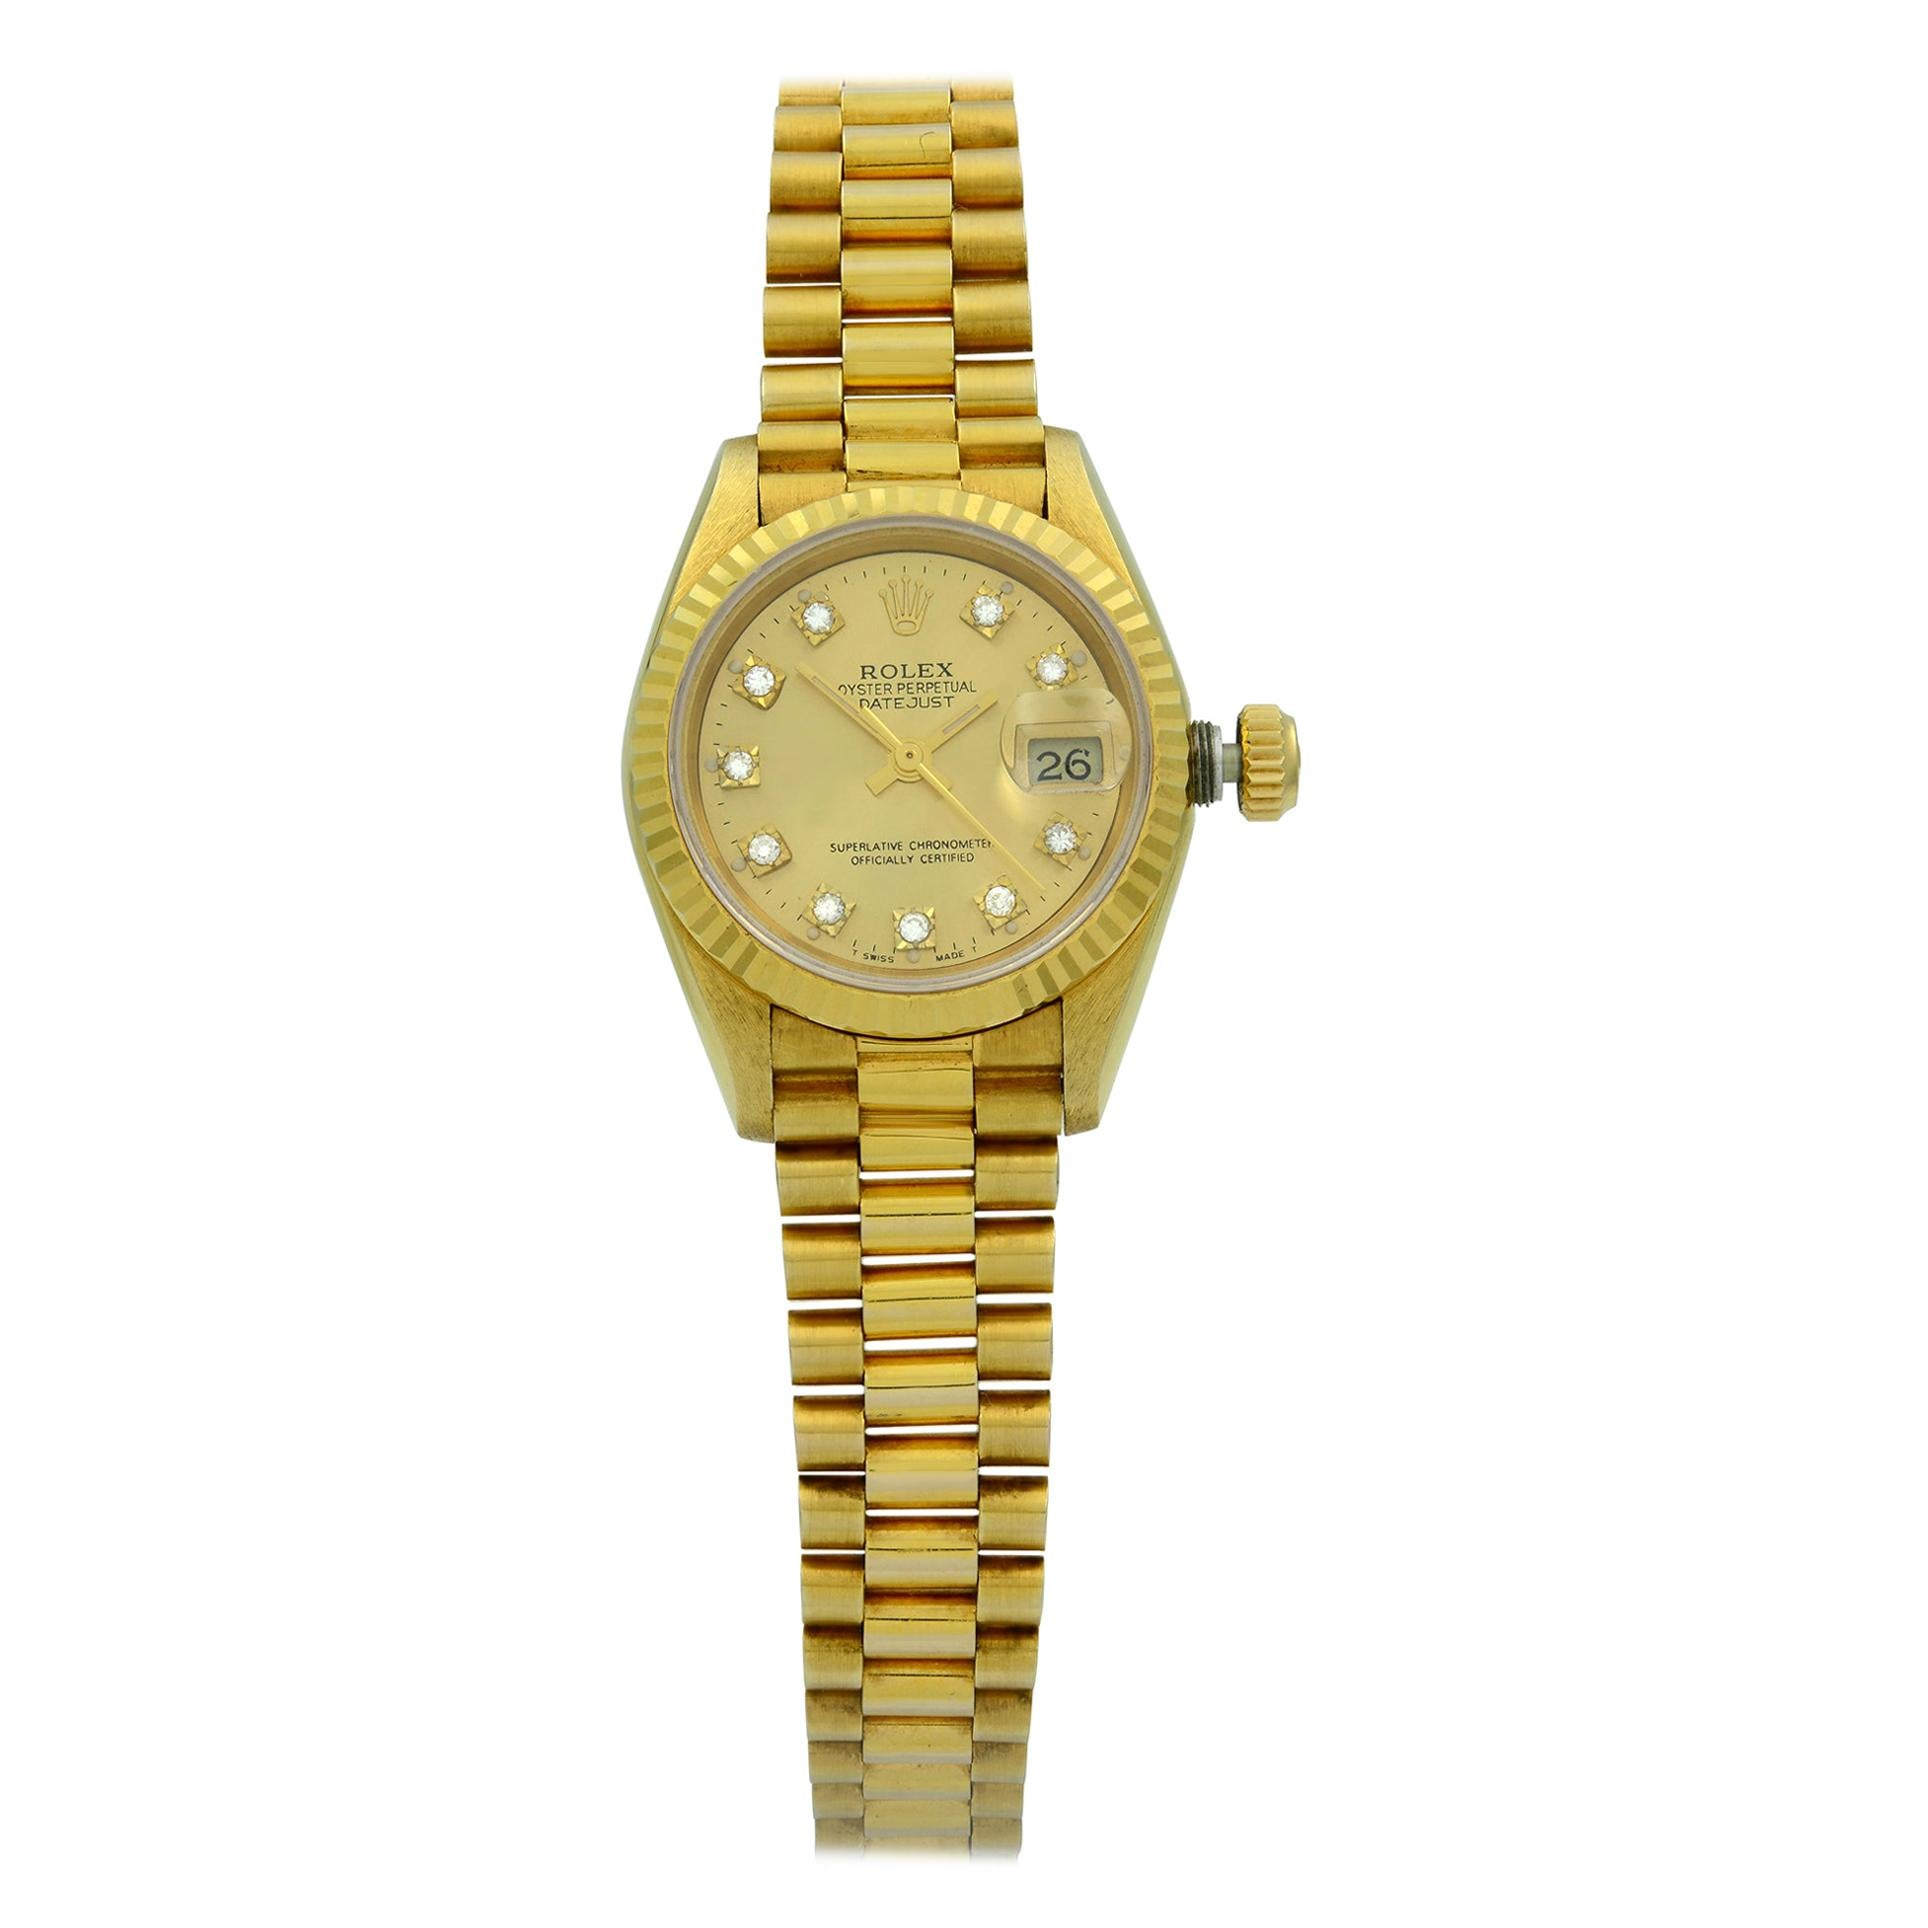 Rolex Datejust 18K Gold Champagne Diamond Dial President Ladies Watch 69178G